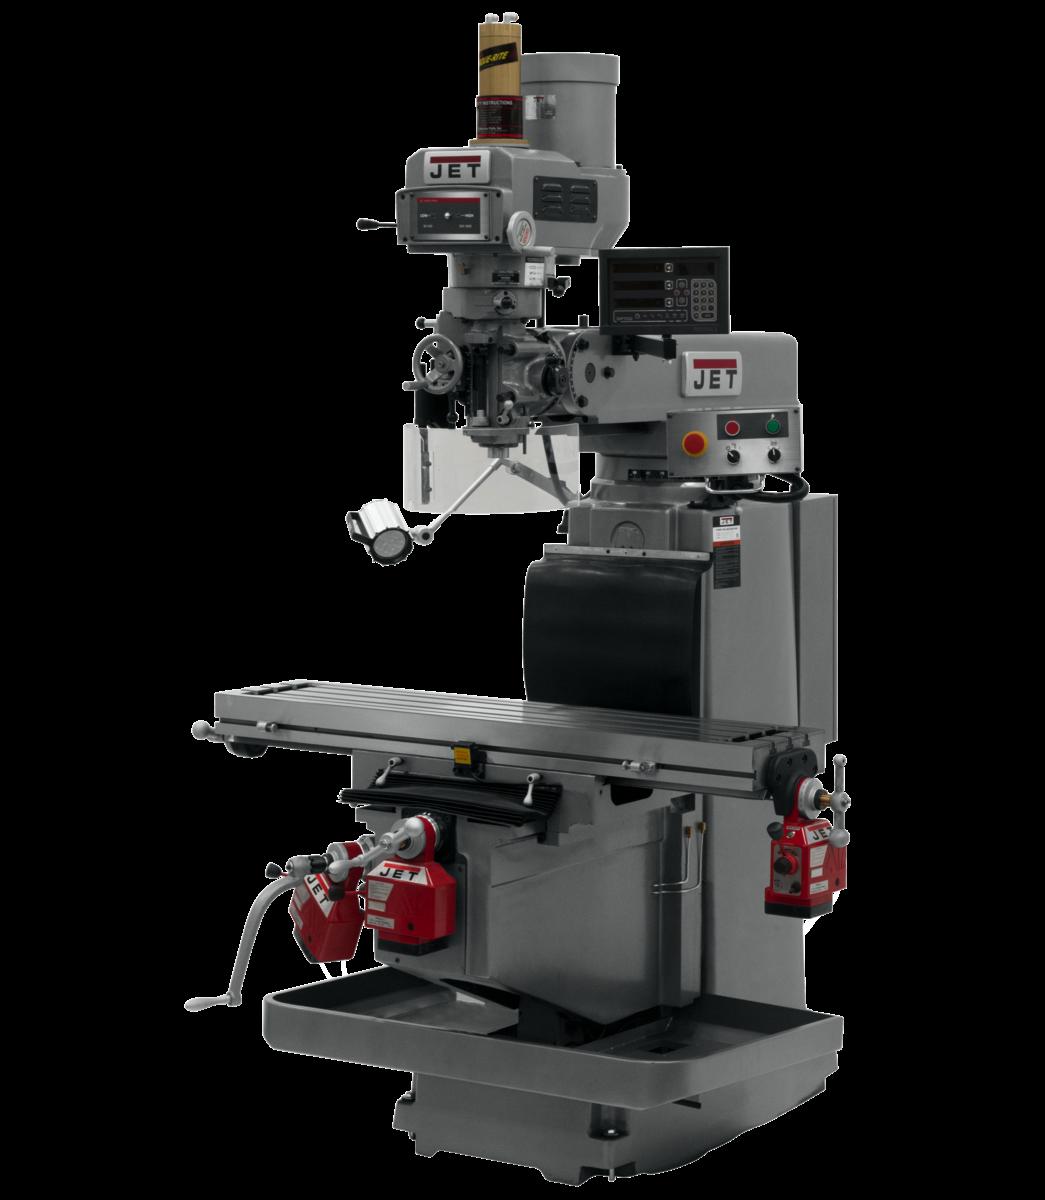 JTM-1254RVS with NEWALL DP700 3X (K) DRO,  X,Y&Z  Powerfeeds & Air Power Drawbar